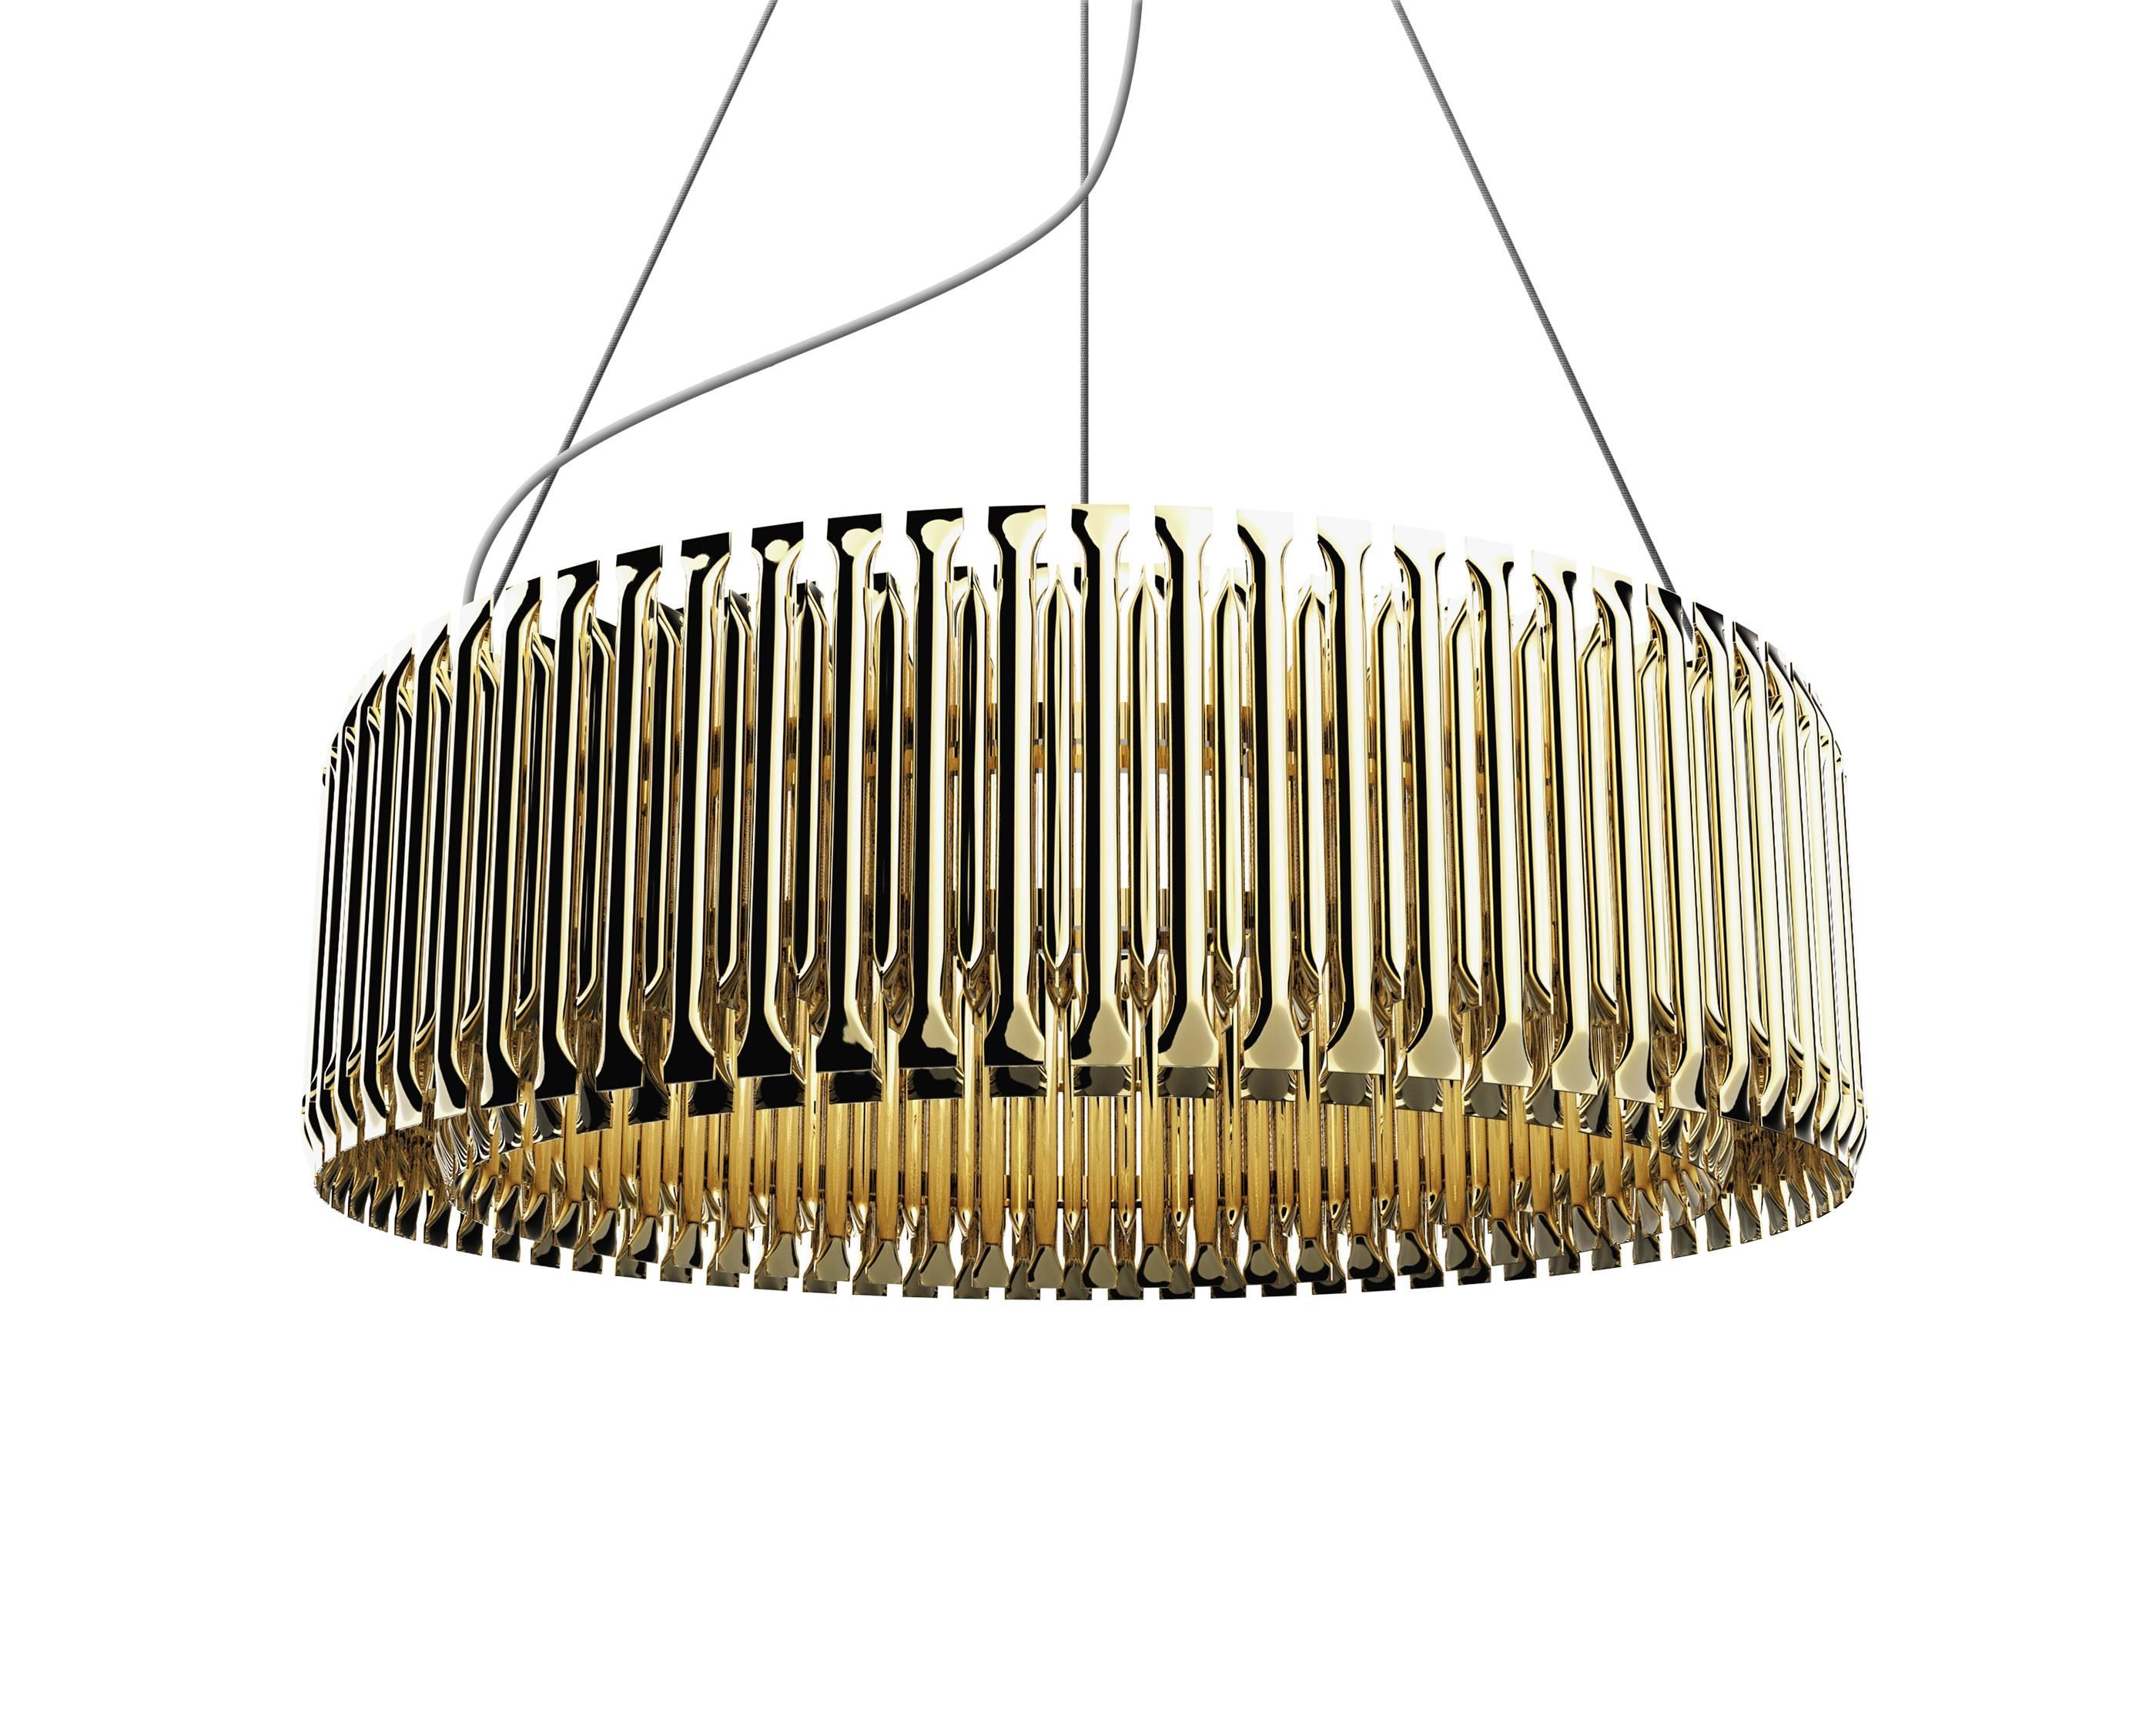 100 Ideas For Unique Light Fixtures - Theydesign - Theydesign regarding Unique Pendant Lights Australia (Image 1 of 15)